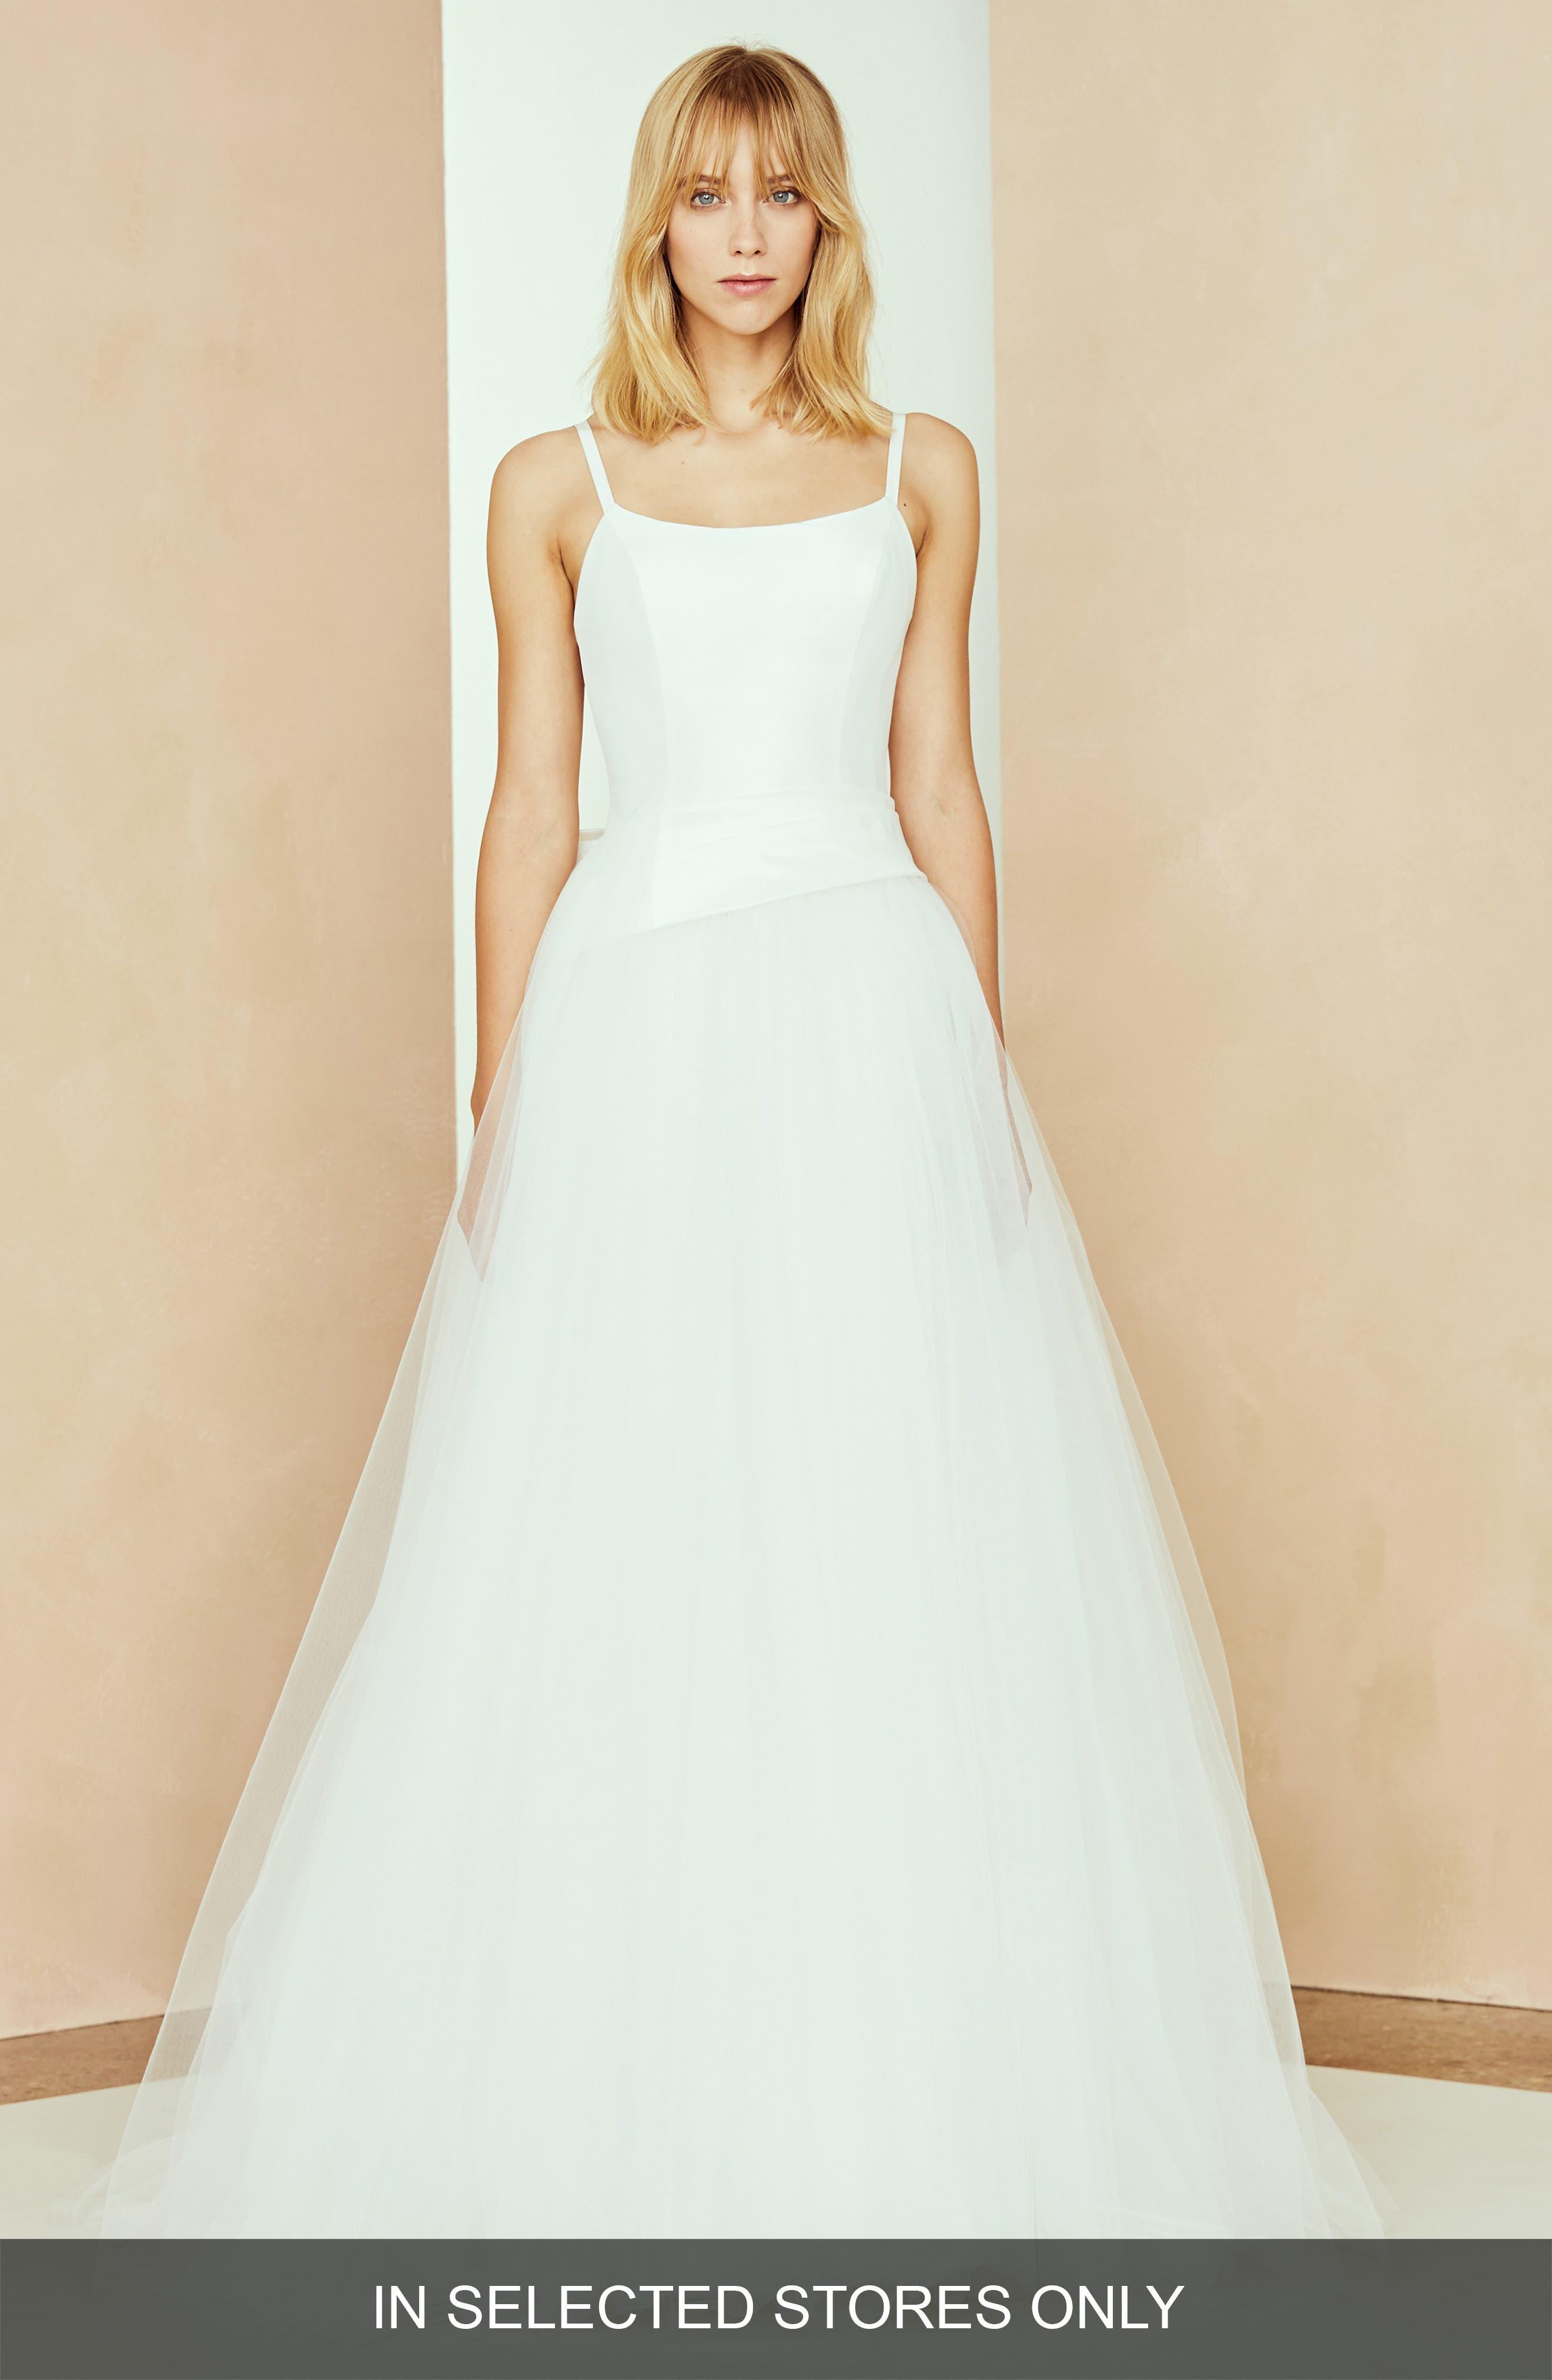 Nouvelle Amsale Lilah Bow Back Taffeta & Tulle Ballgown, Size - White